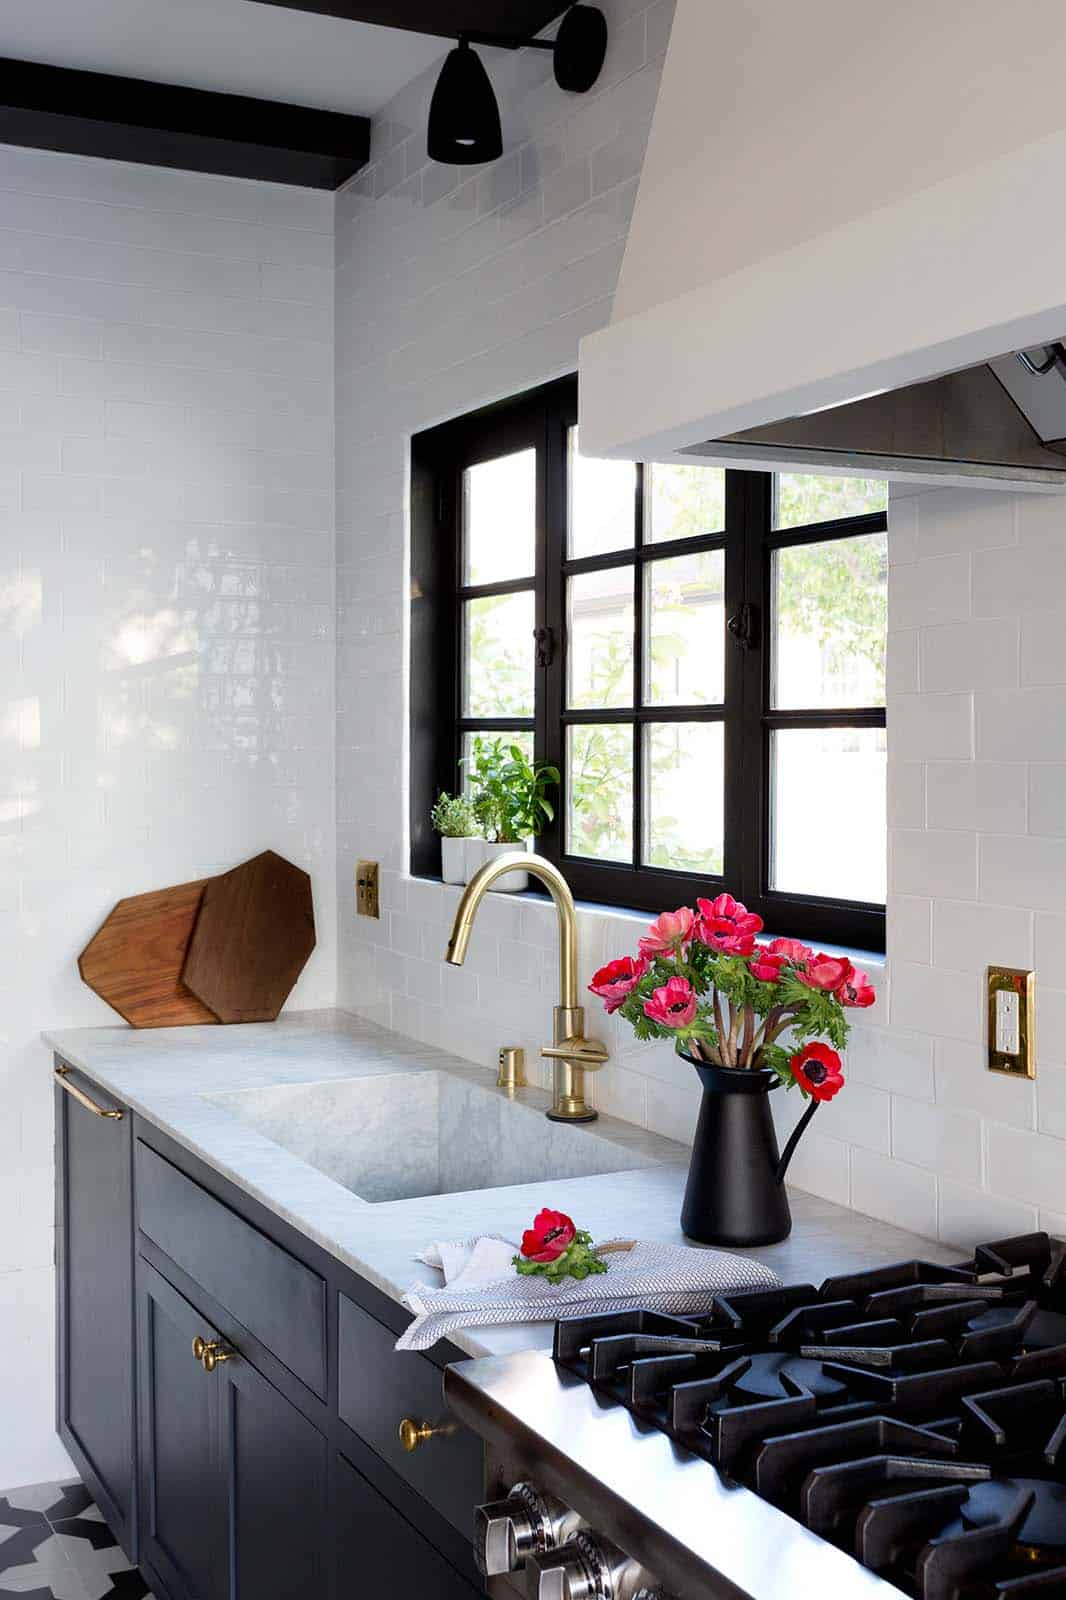 Style espagnol Home-Jette Creative-10-1 Kindesign